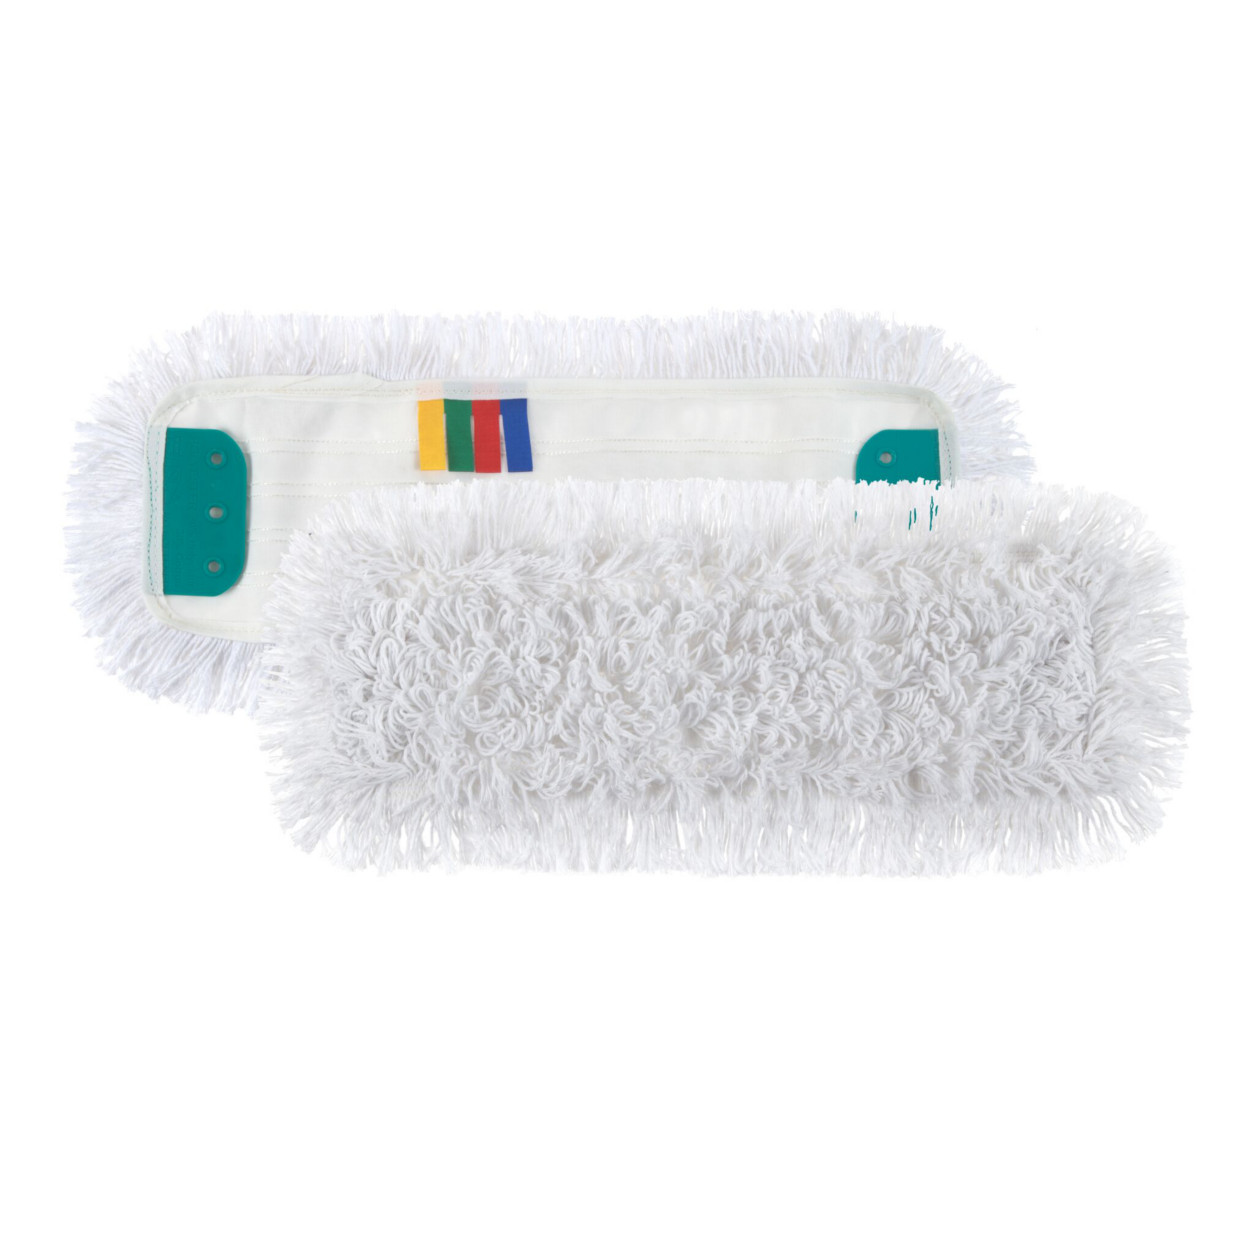 Polyesterový plochý mop, bílý